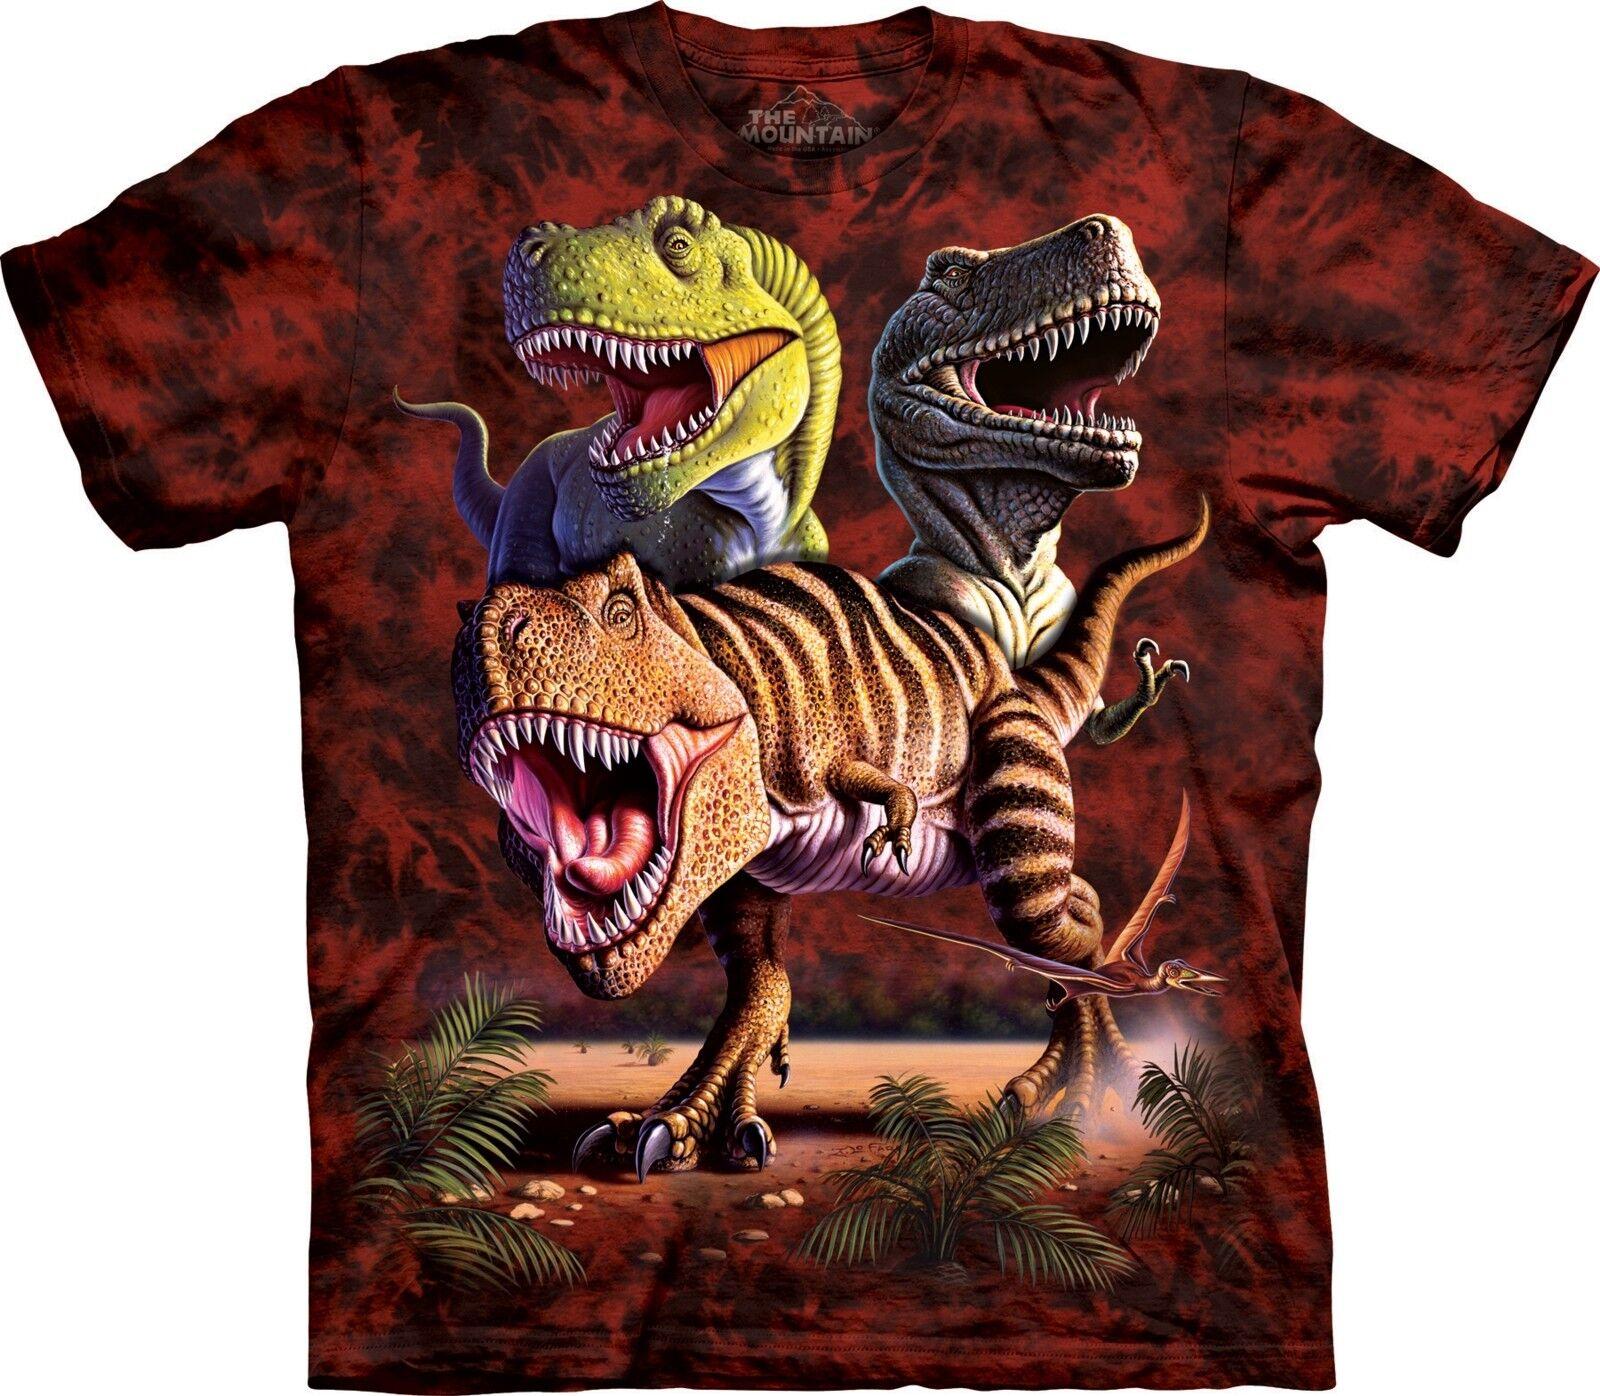 Rex Collage -Dinosaur Shirt Adult Unisex The Mountain